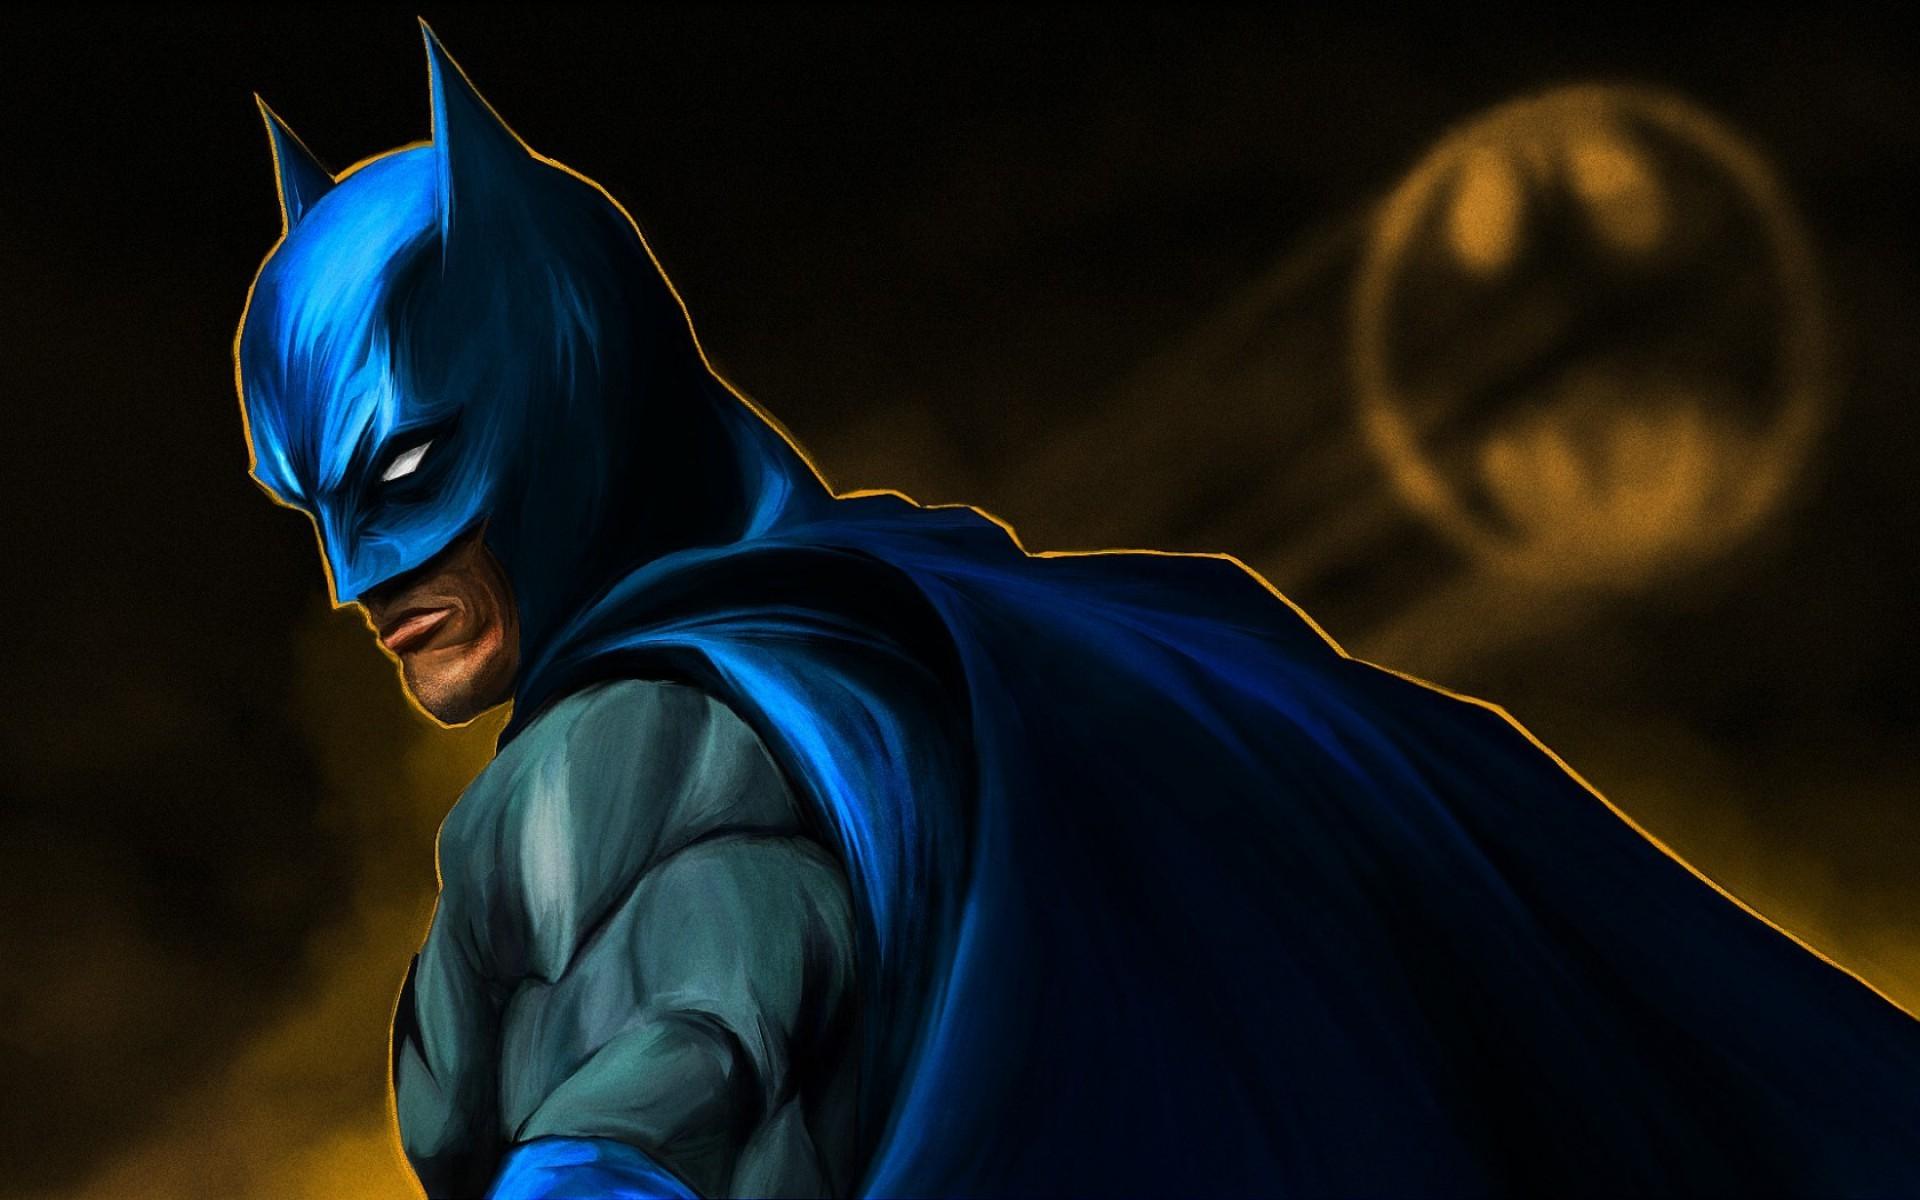 Dc comics wallpapers hd 65 images - Superhero background wallpaper ...